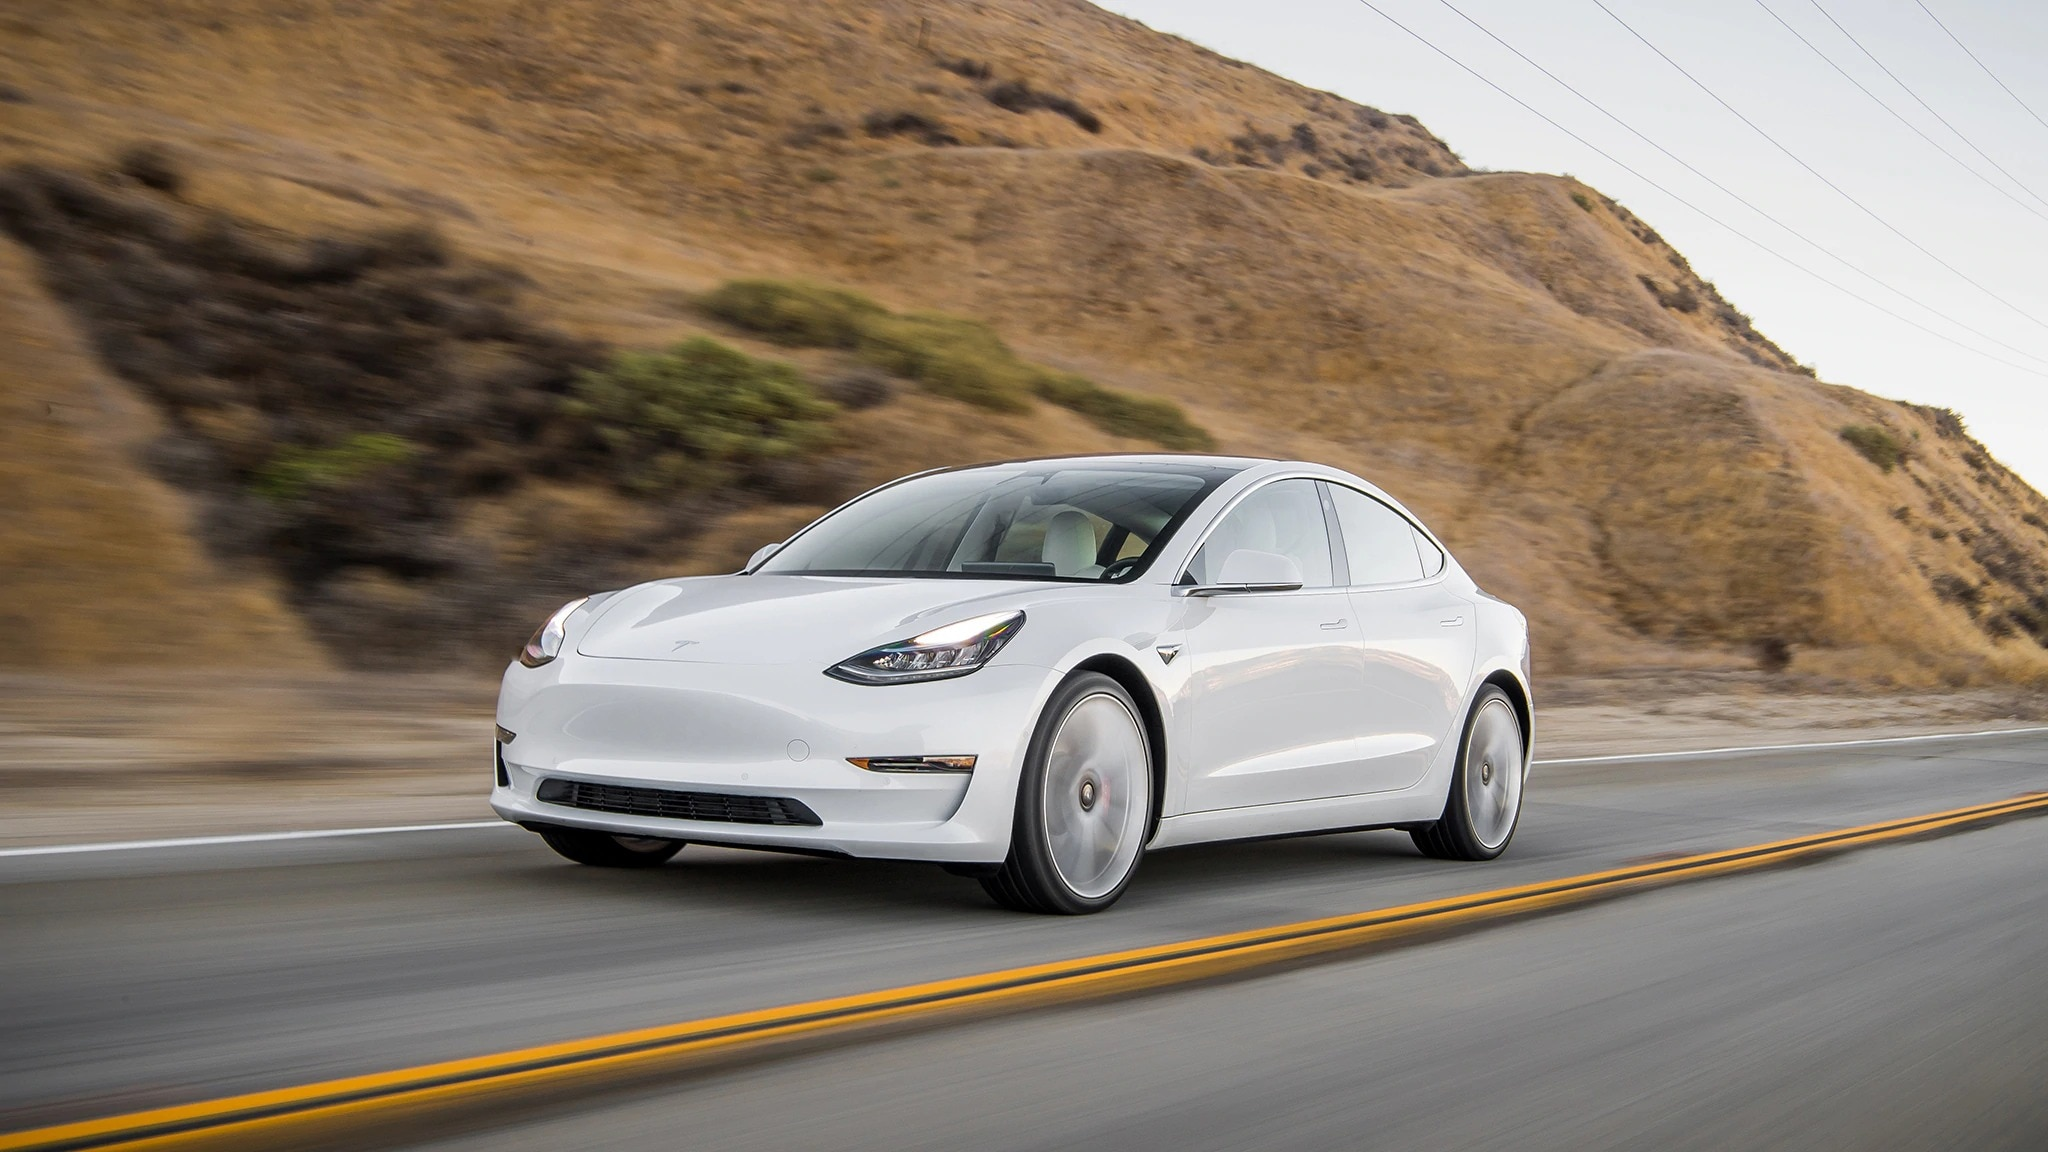 2021 Tesla Model 3 Packs More Range Interior and Exterior 2048x1152